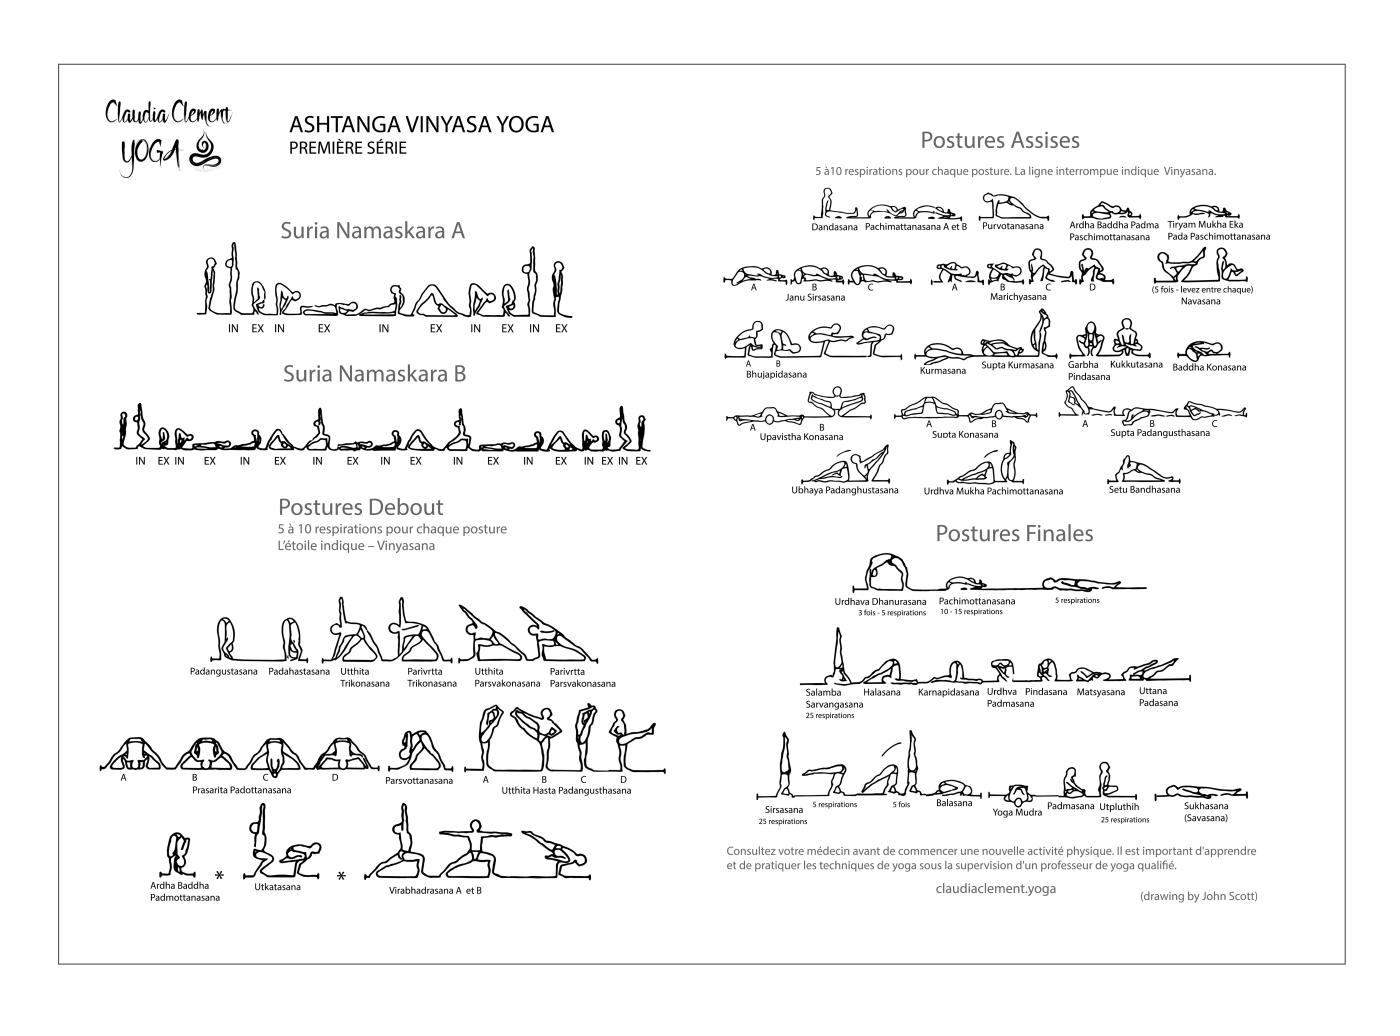 ashtanga vinyasa yoga, la premiere serie